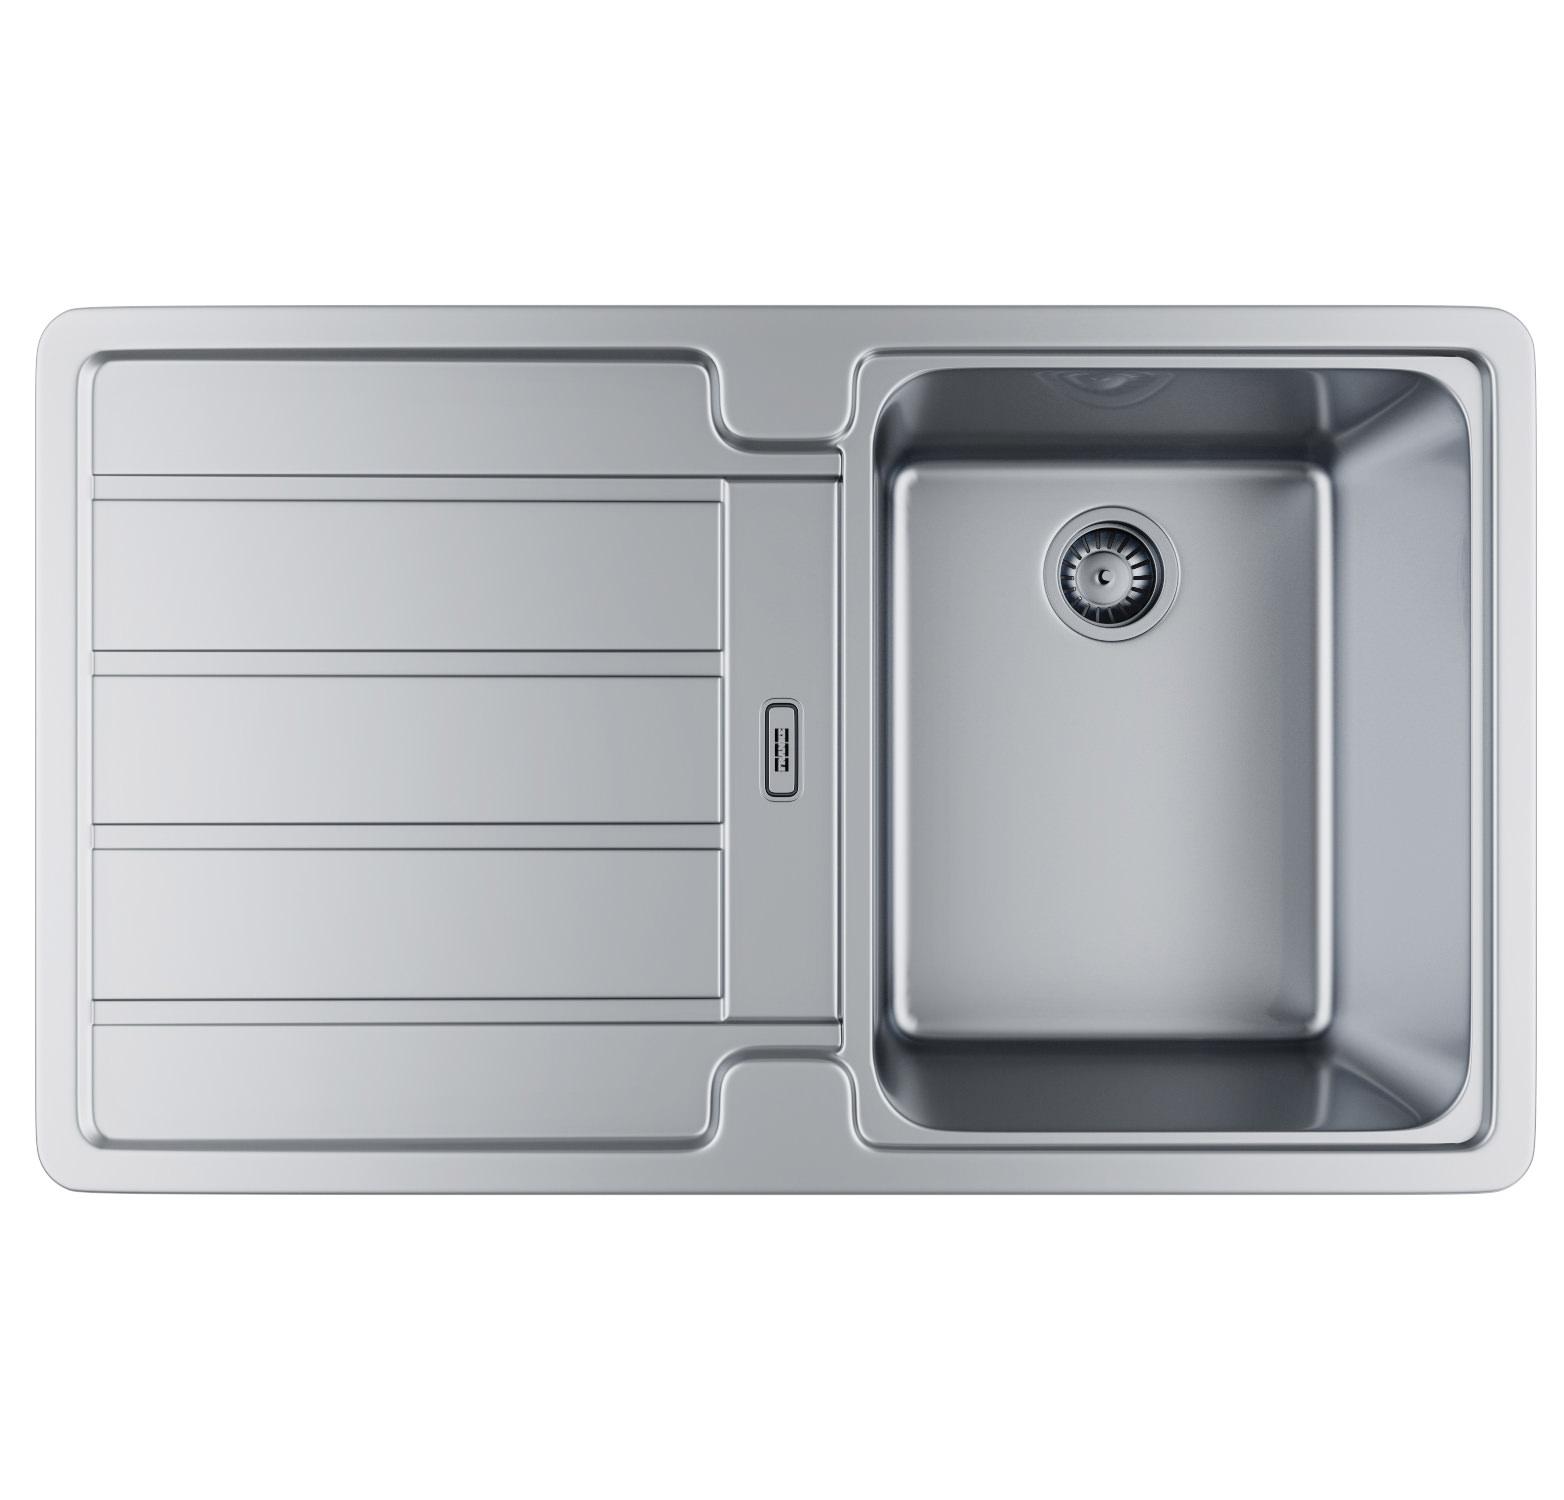 ... sink franke hydros hdx 614 stainless steel 1 0 bowl kitchen inset sink